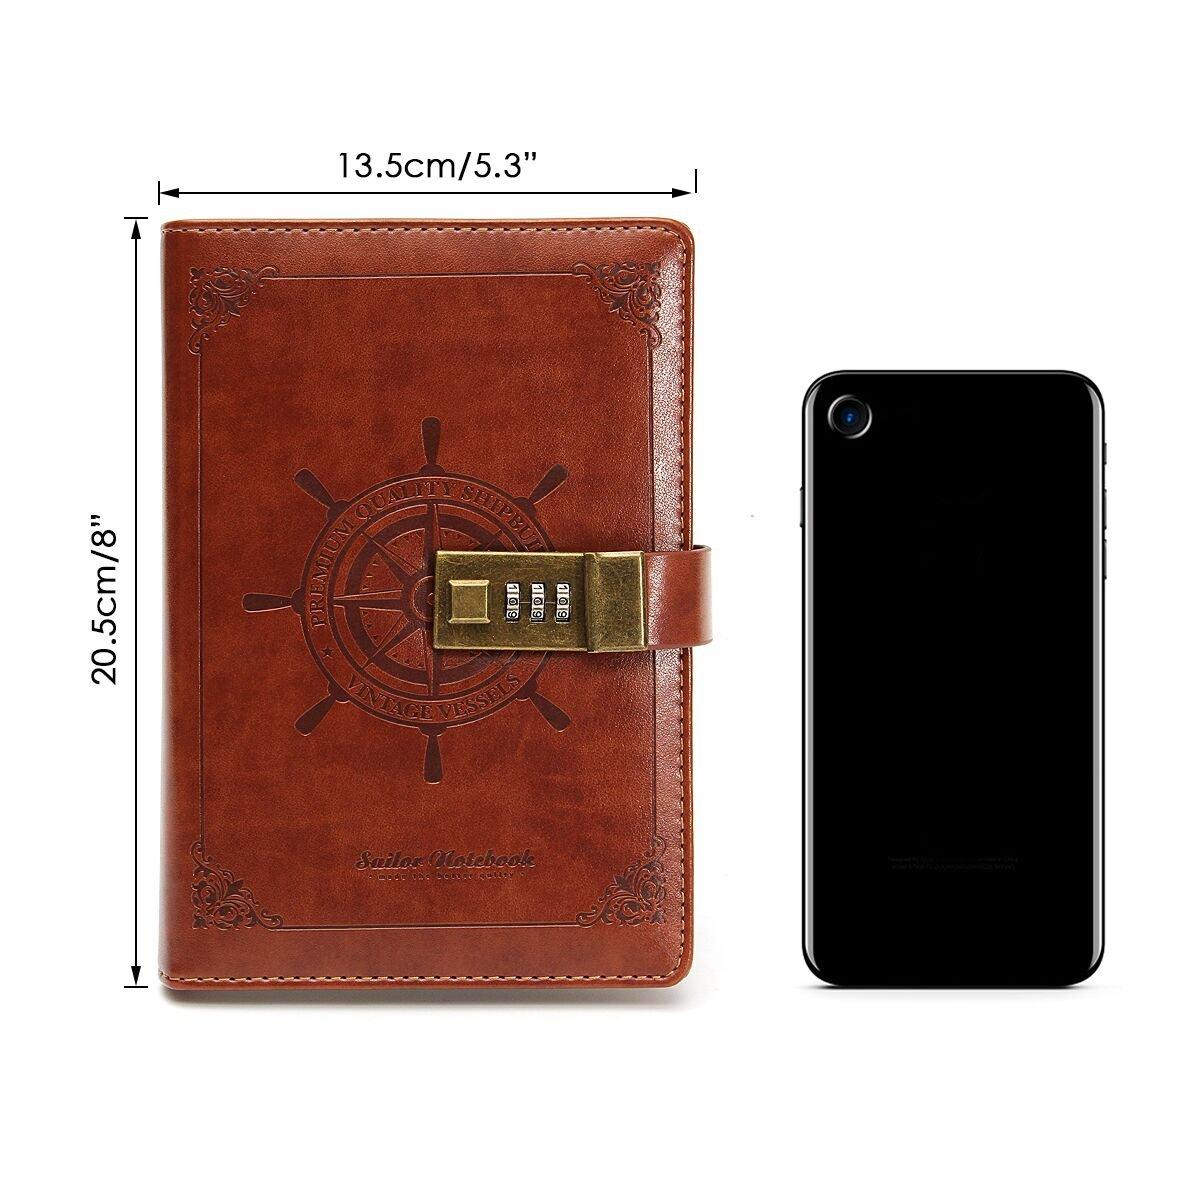 MOHOO Tagebuch Vintage-PU-Leder-Tagebuch Password Notebook, Password ...